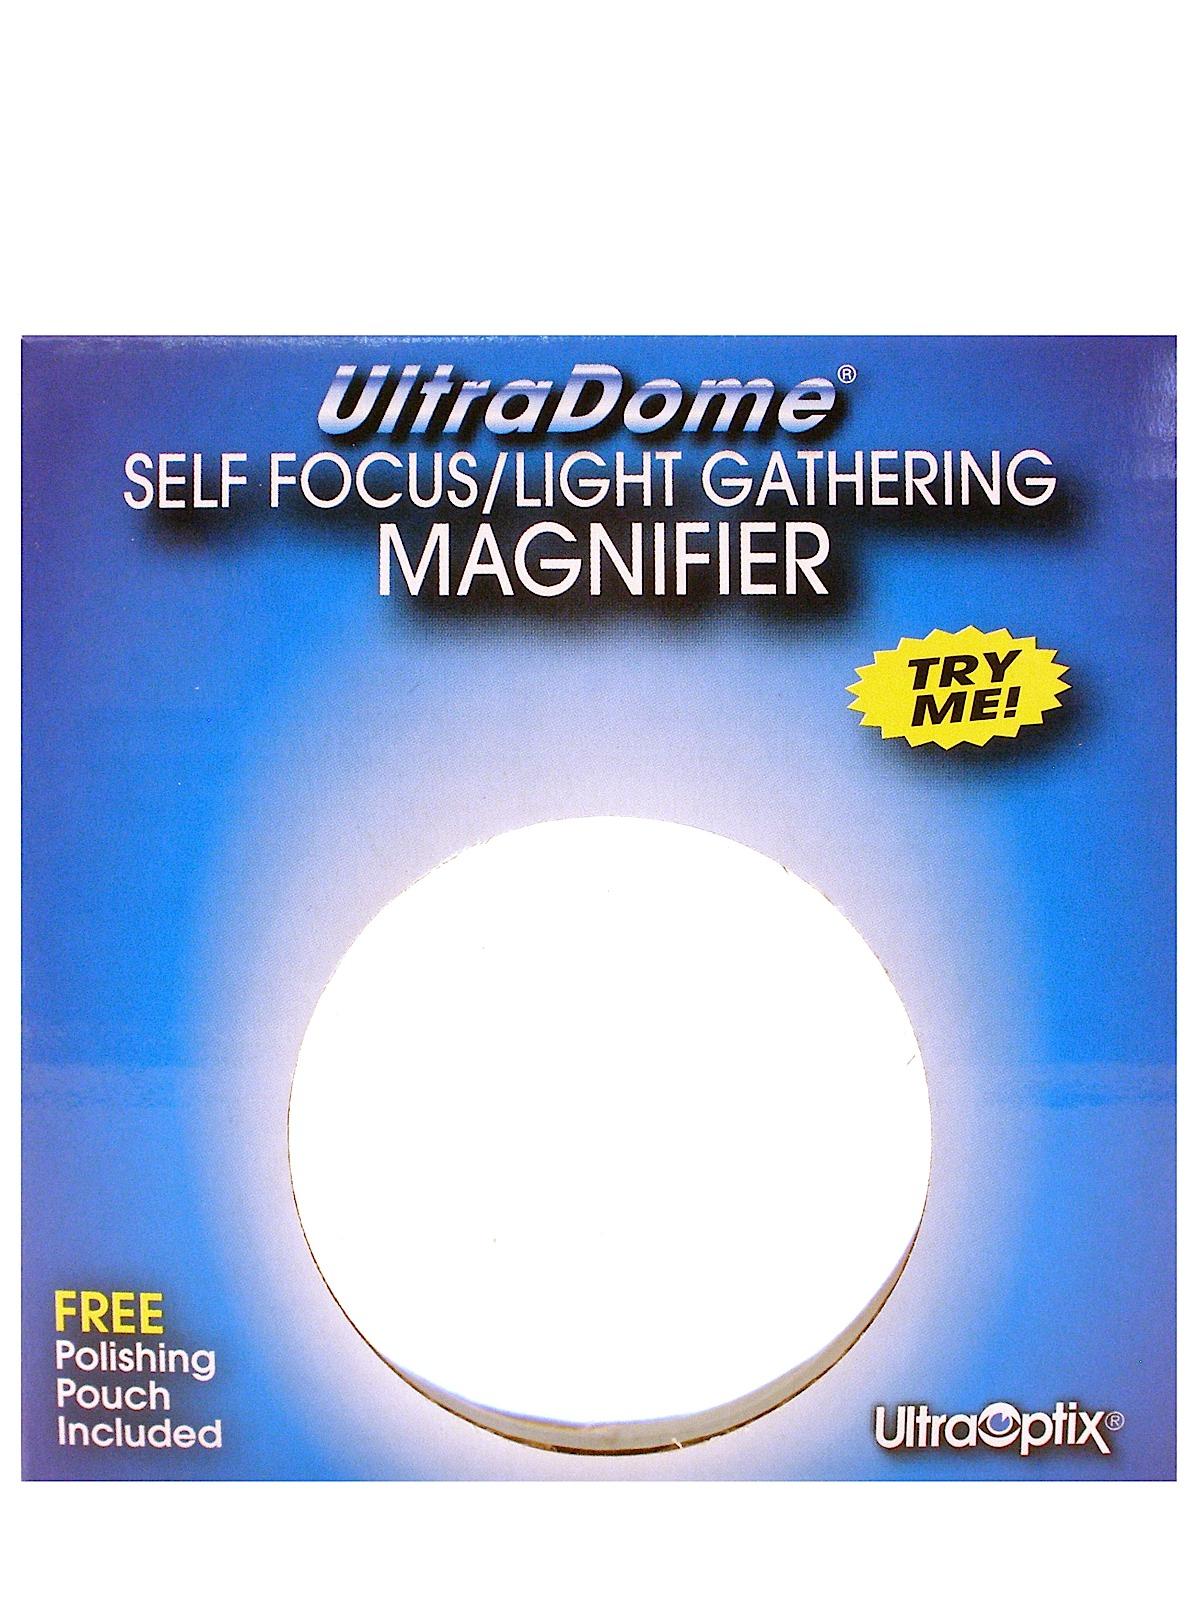 UltraDome Magnifier